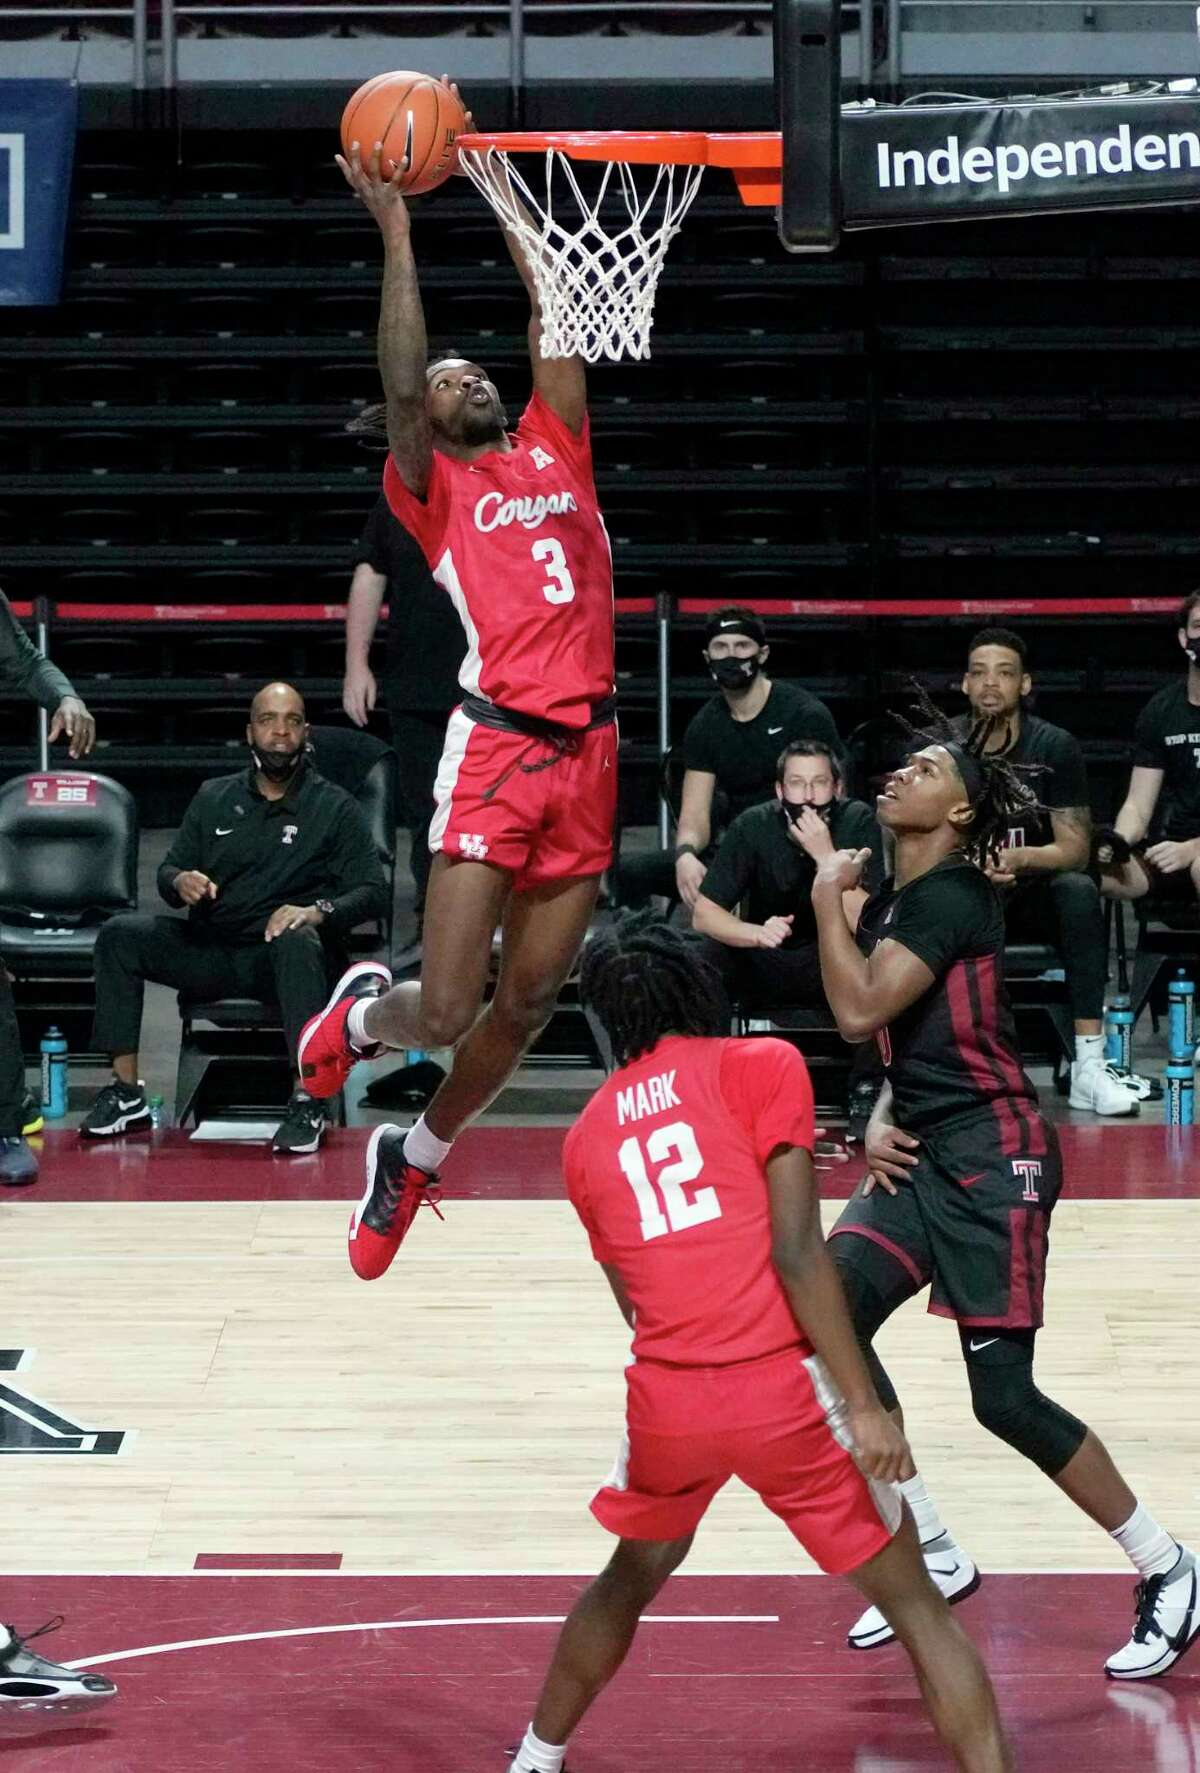 Houston's Houston's DeJon Jarreau (3) takes a shot over Temple's Khalif Battle (0) in the first half of an NCAA college basketball game, Saturday, Jan. 23, 2021, in Philadelphia.